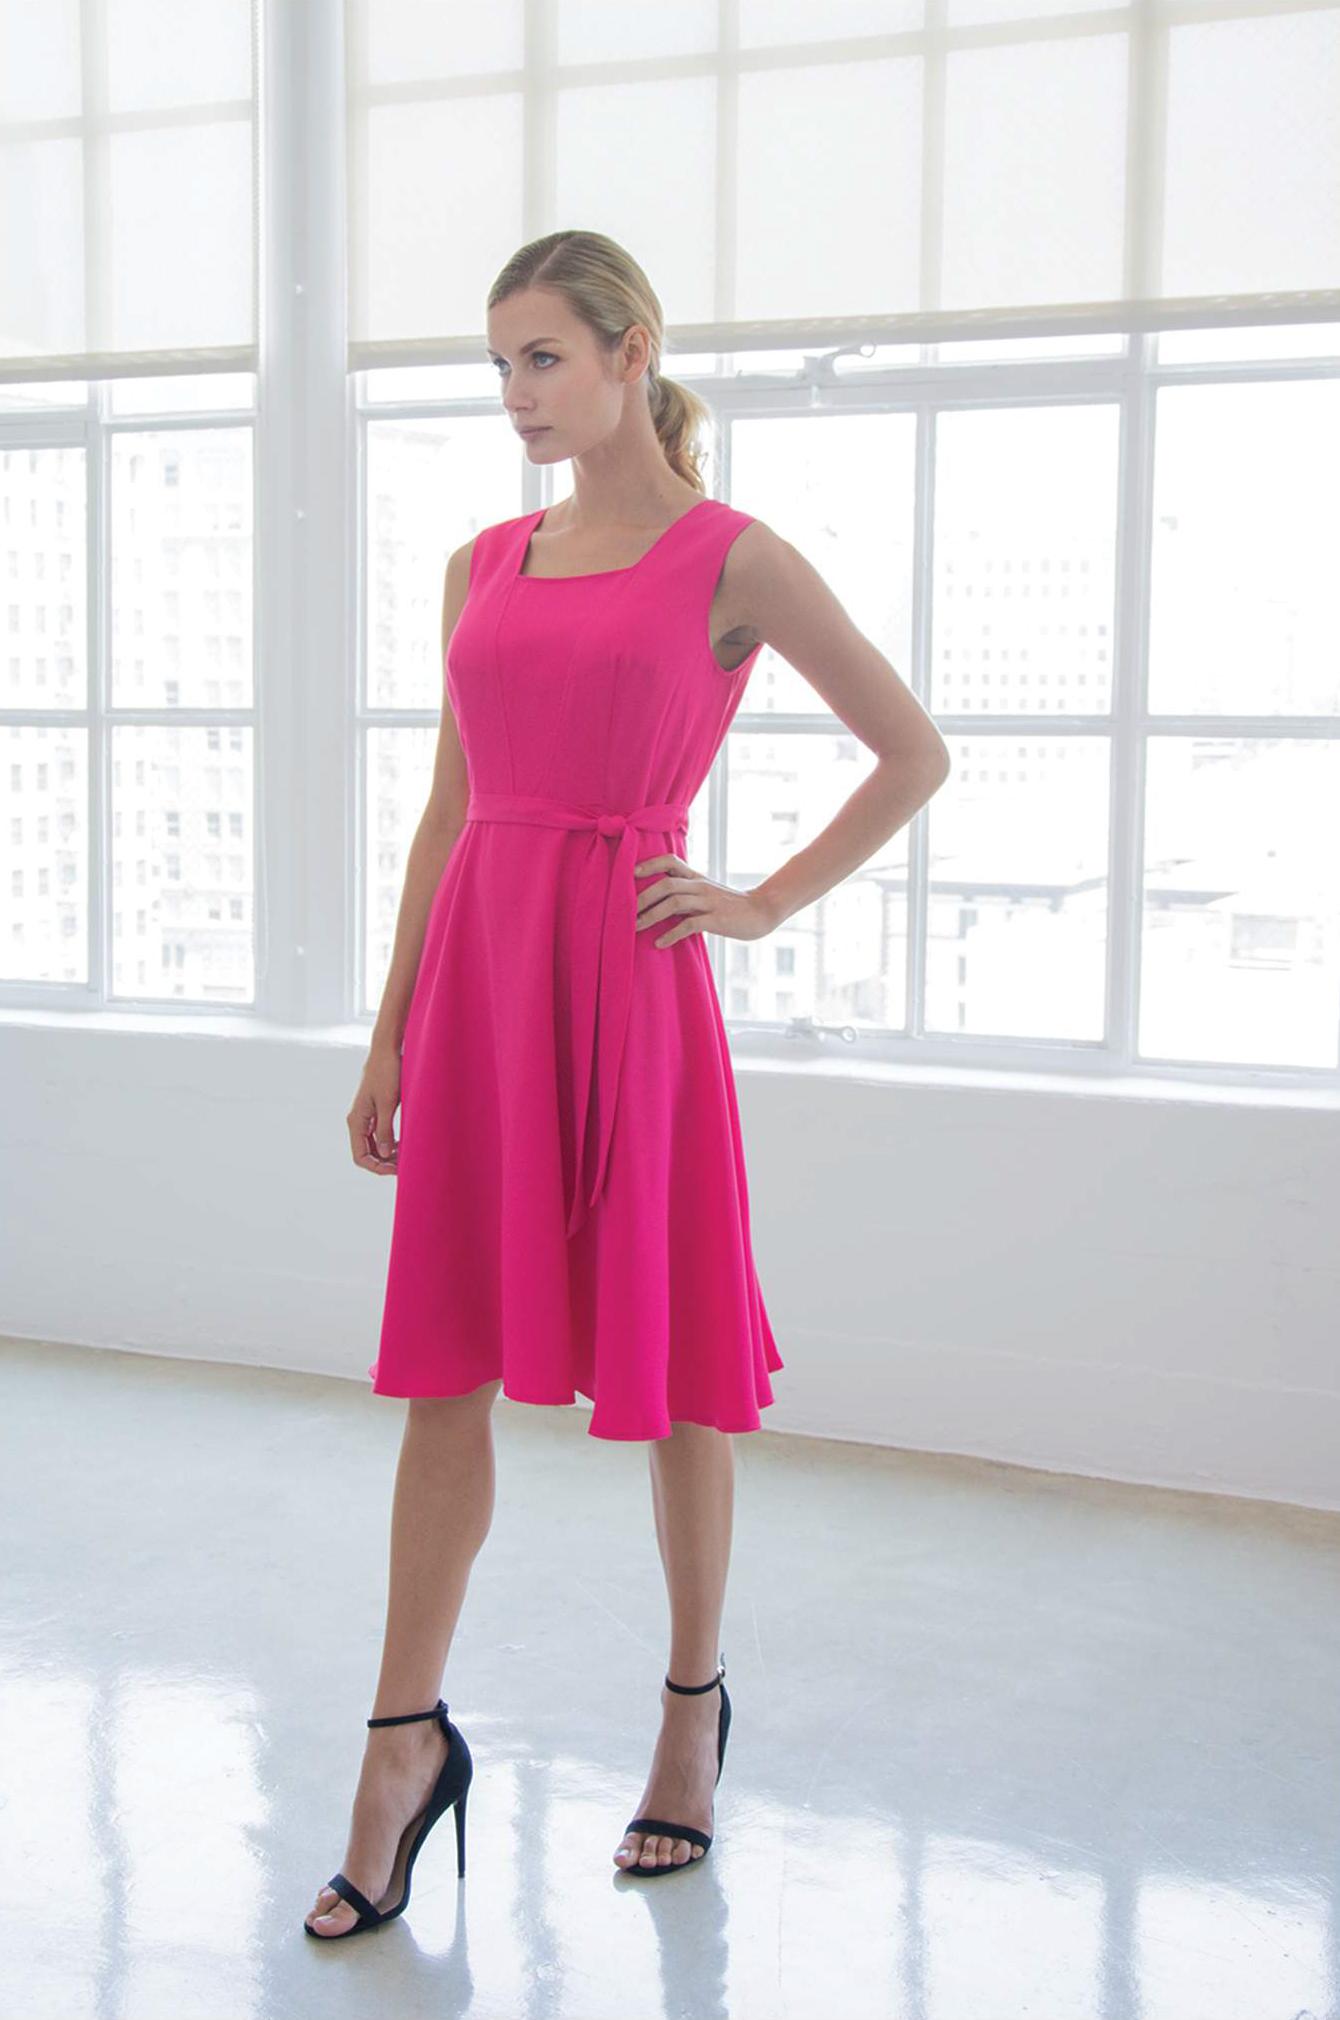 Dress: Iris - SANTORELLI